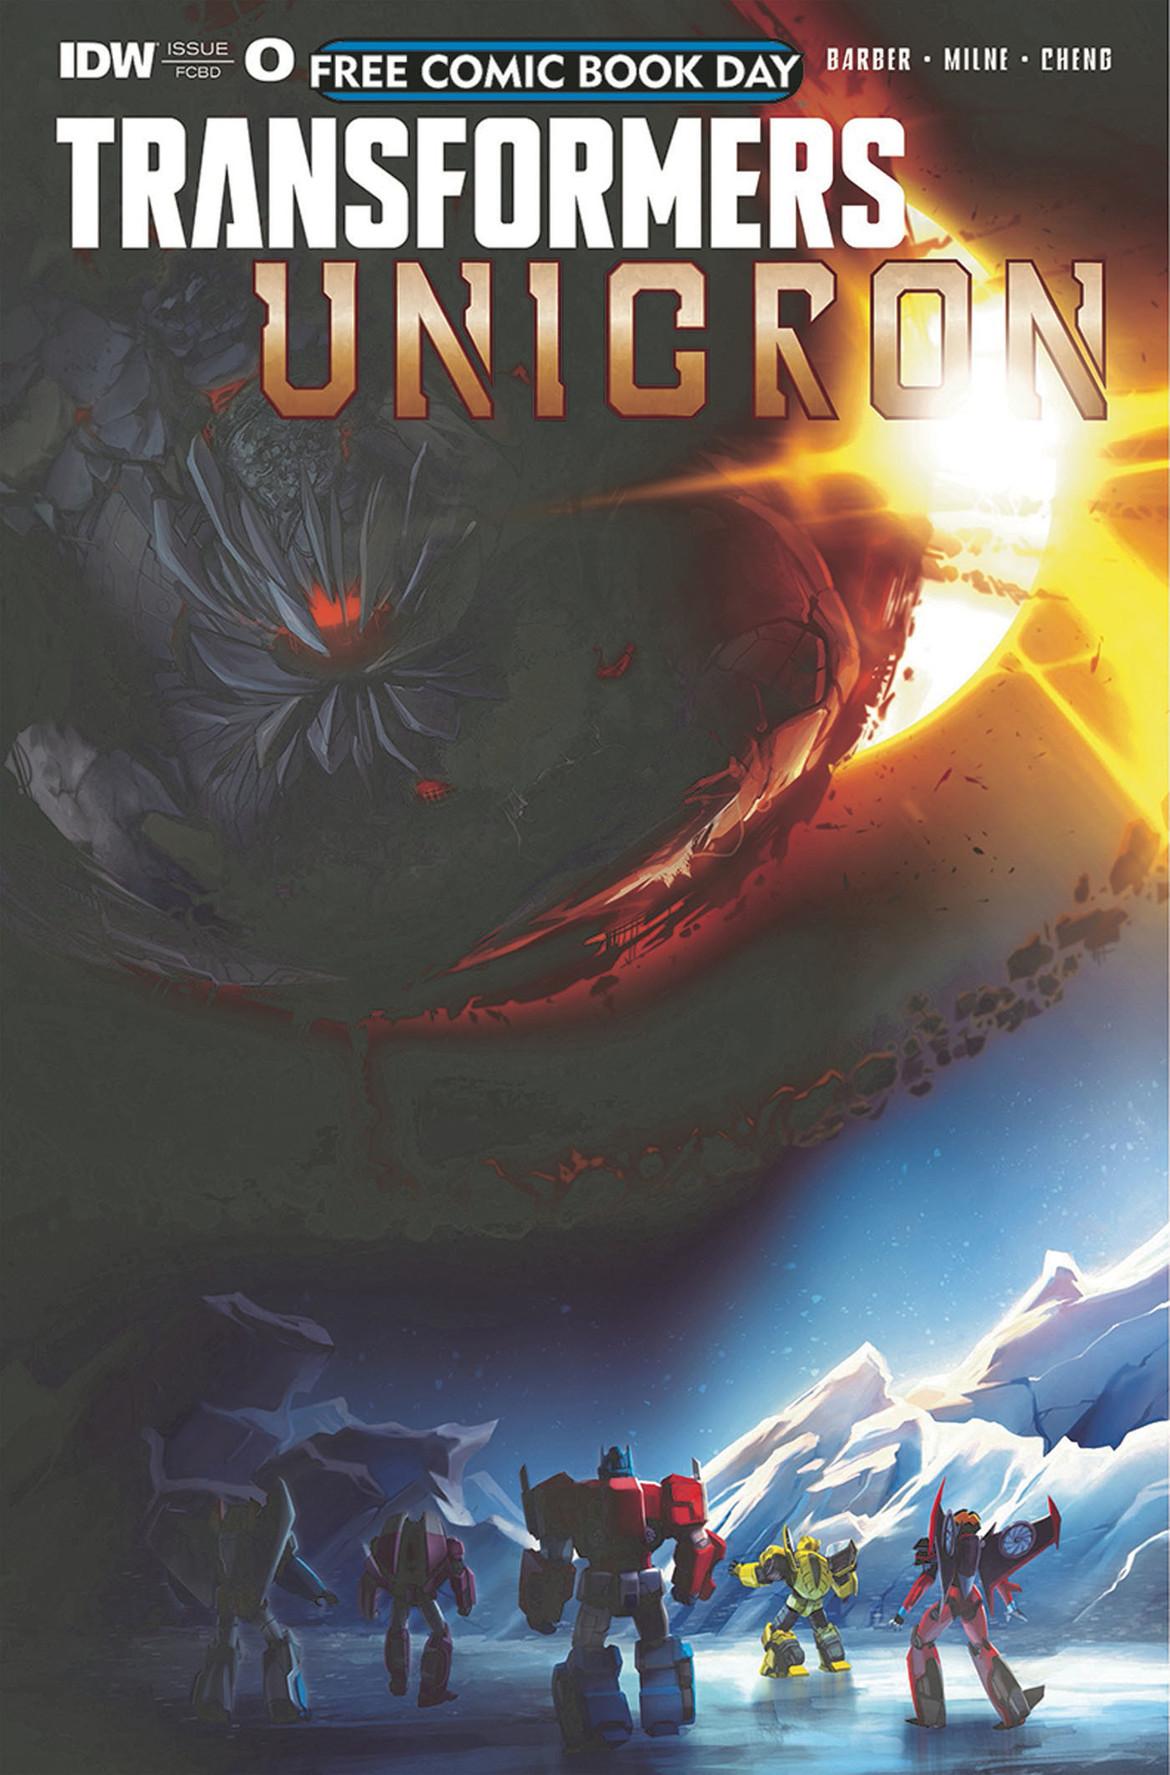 Transformers: Unicron FCBD 2018